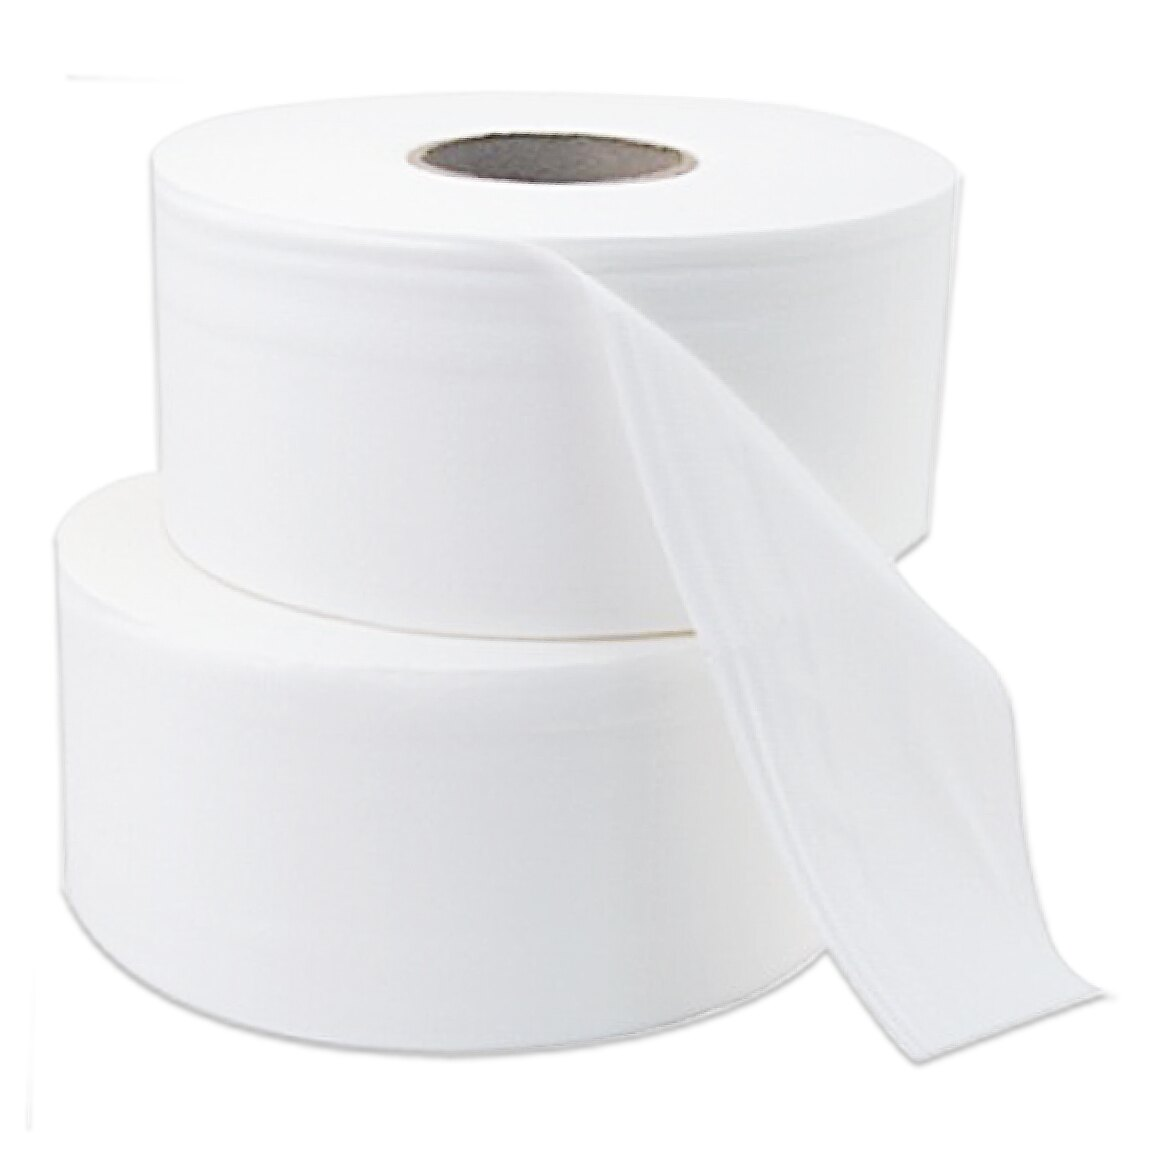 【HELLO】大捲衛生紙12捲/箱